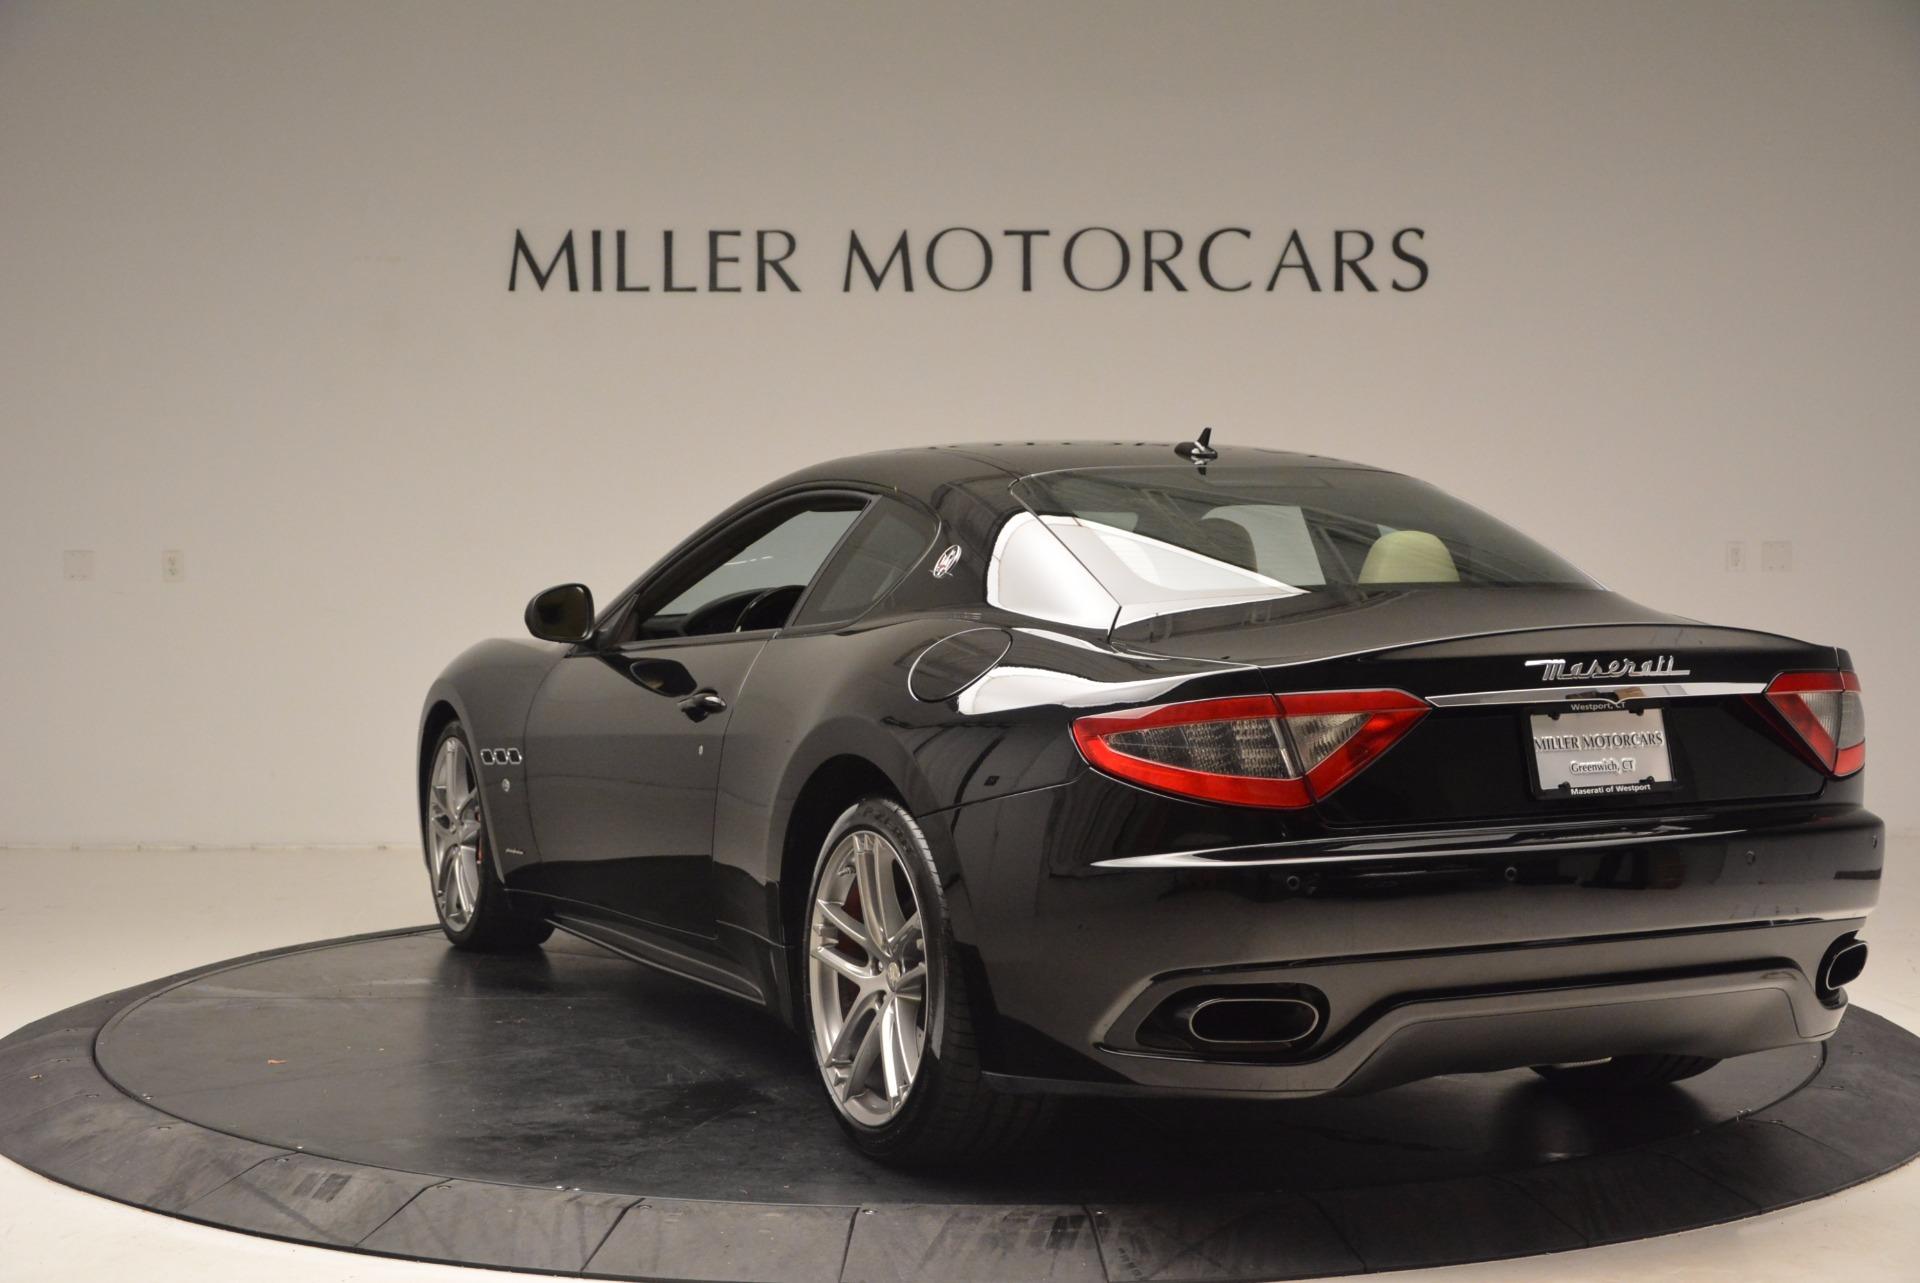 Used 2015 Maserati GranTurismo Sport Coupe For Sale In Westport, CT 1557_p5